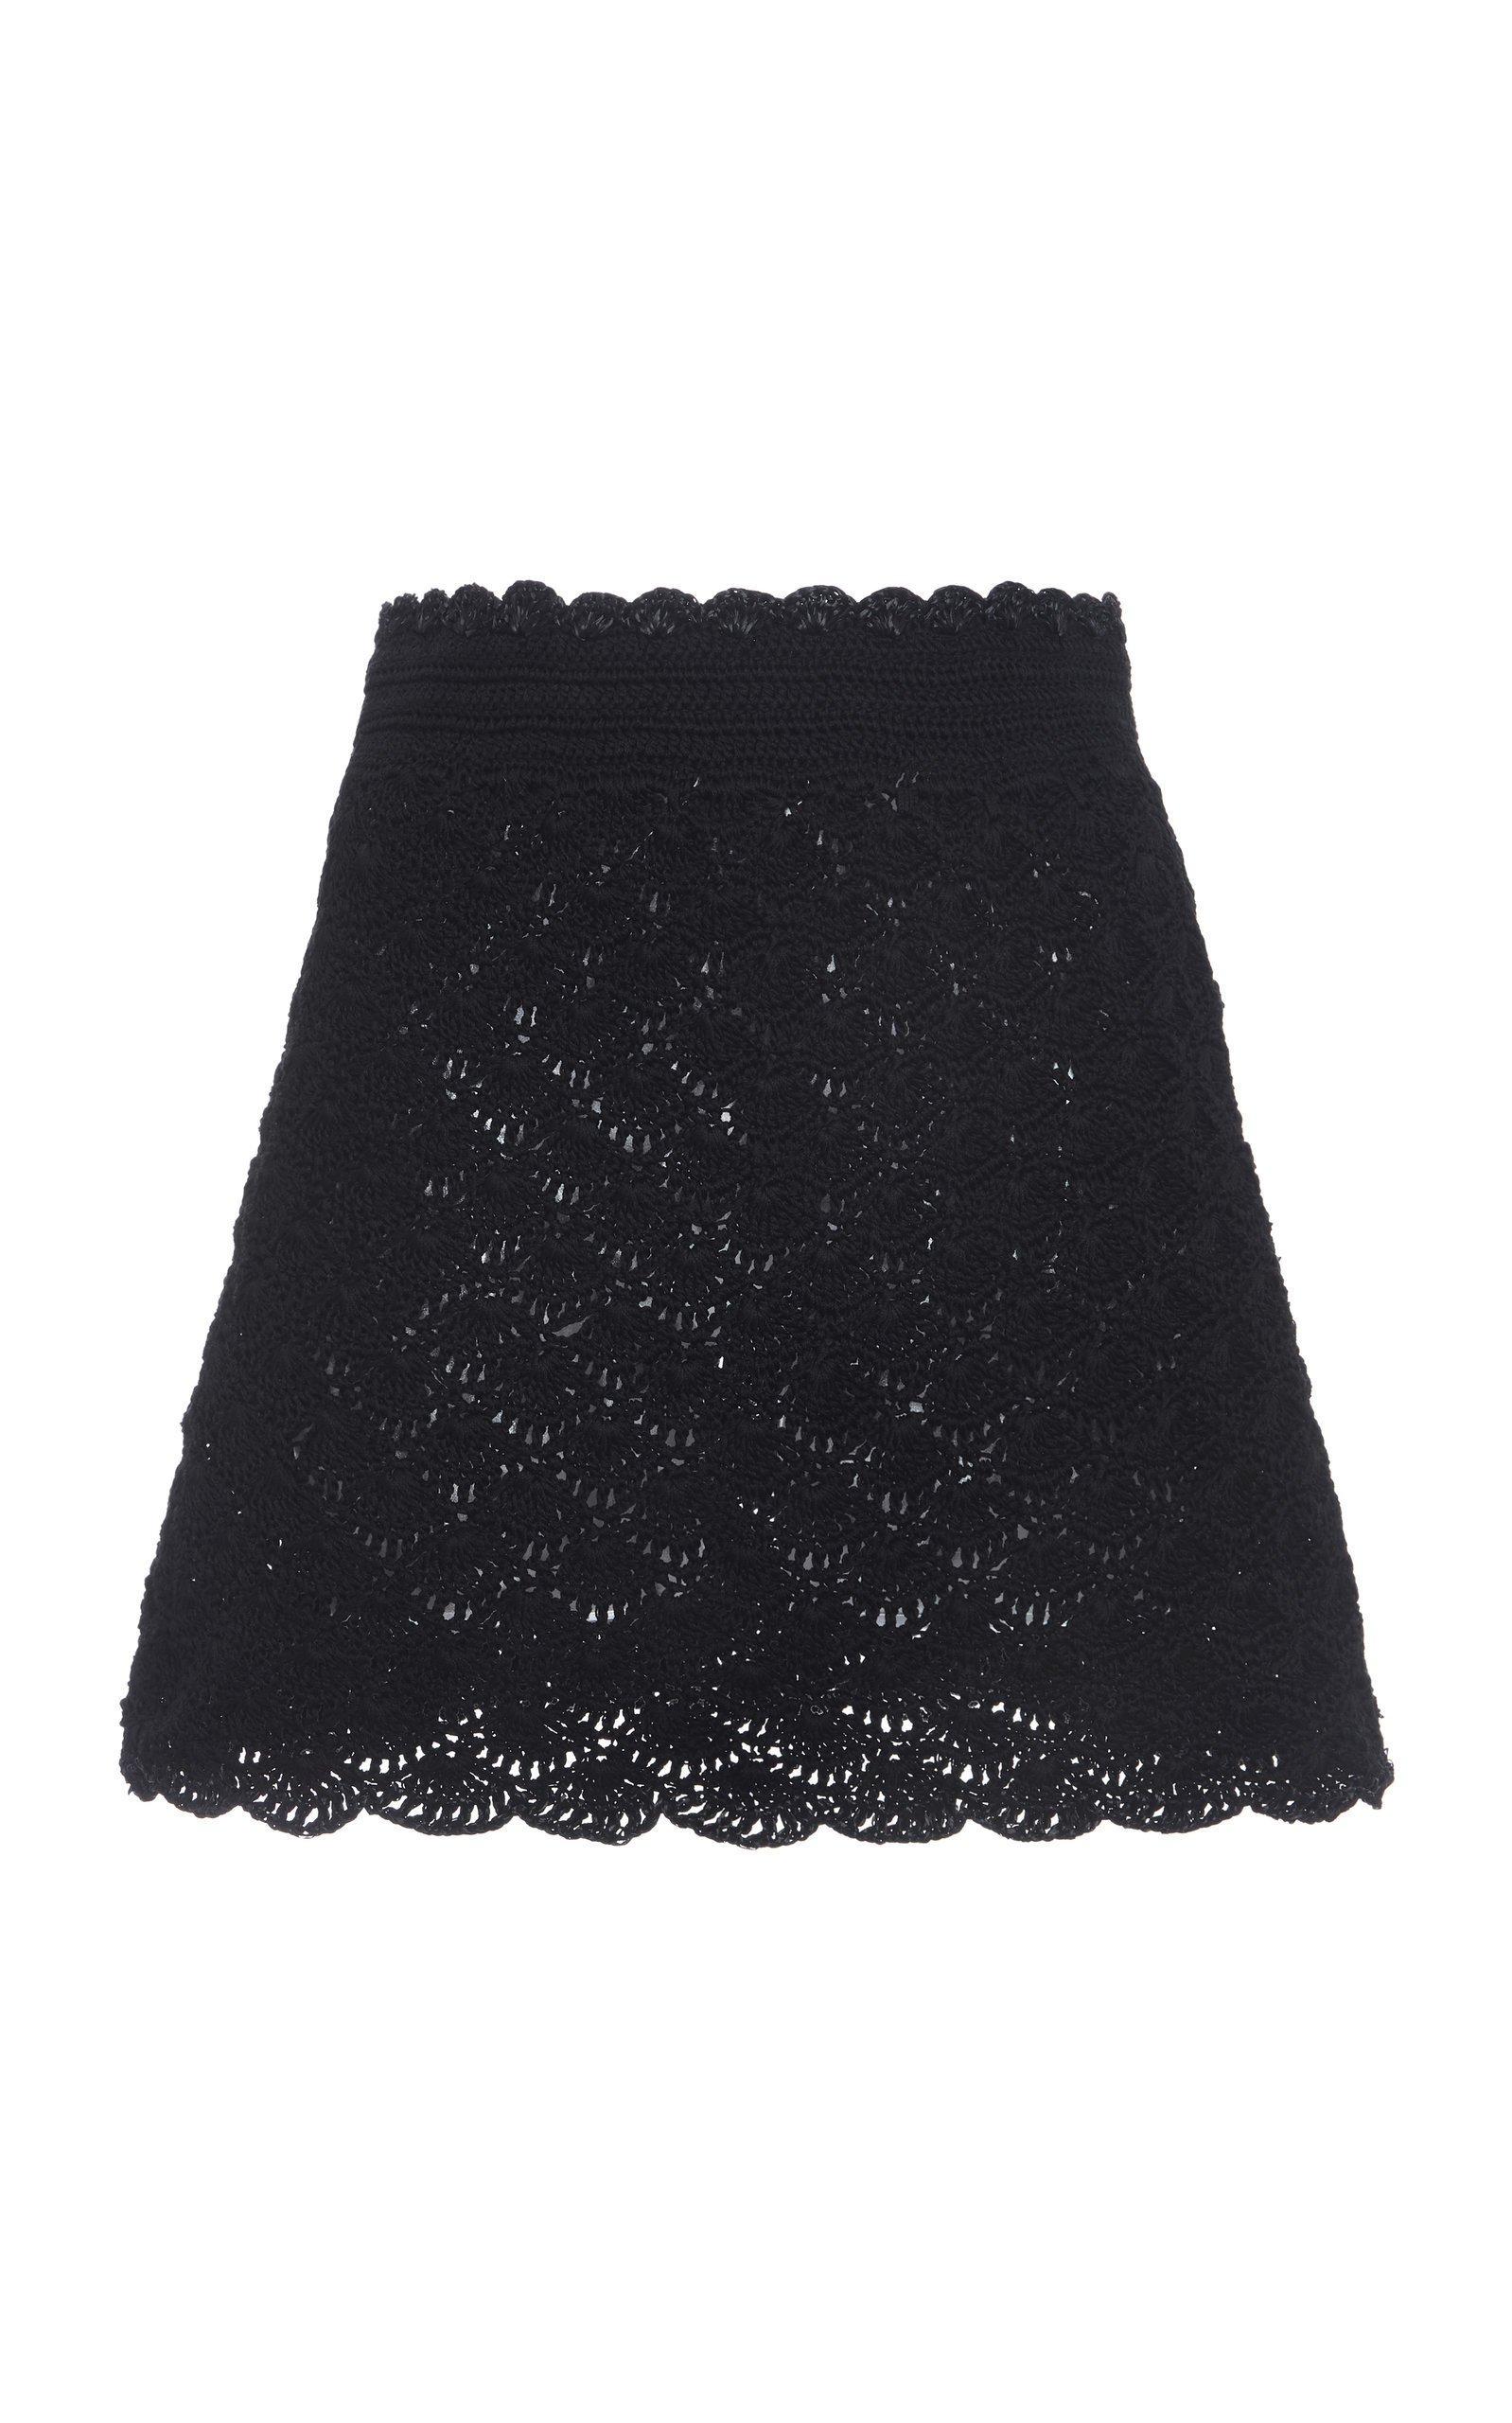 Dolce & Gabbana Crochet-Knit Mini Skirt Size: 36